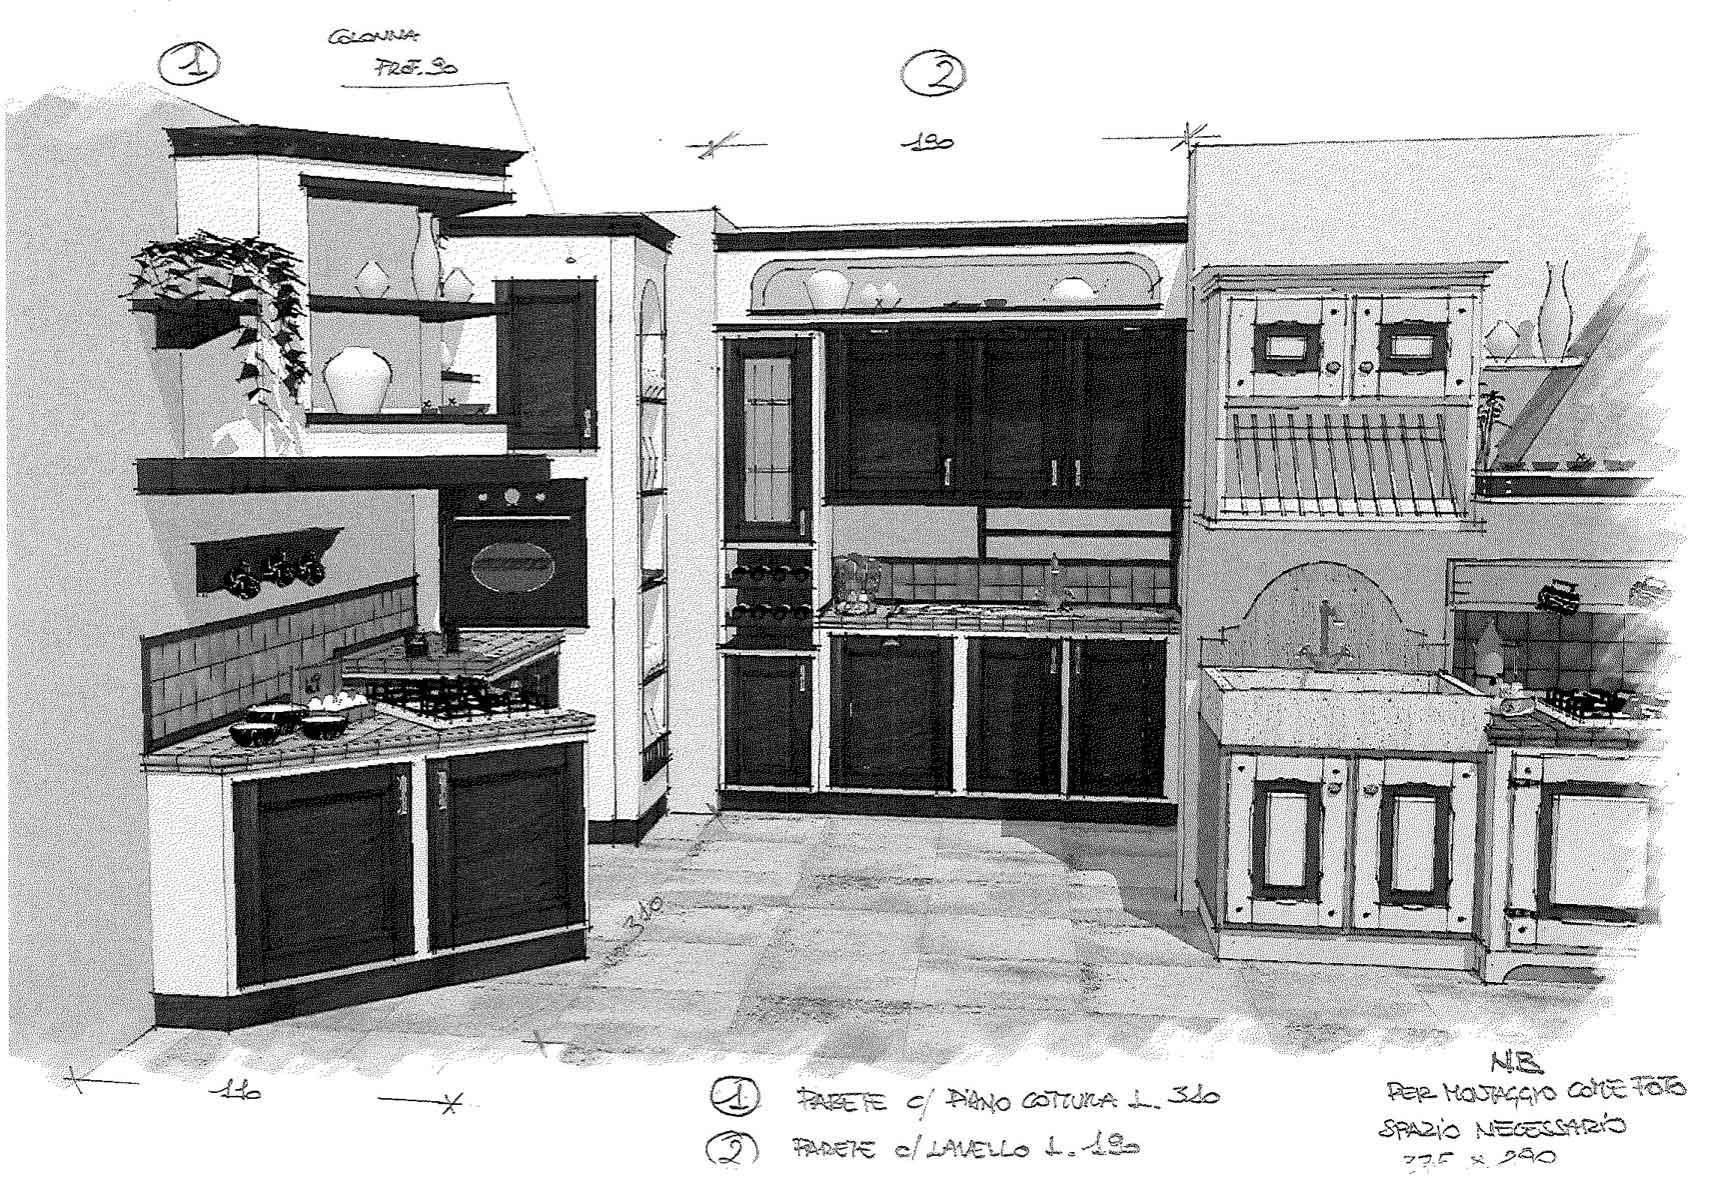 Cucina 2 blocchi bottega dell 39 arte - Liquidazione cucine ...